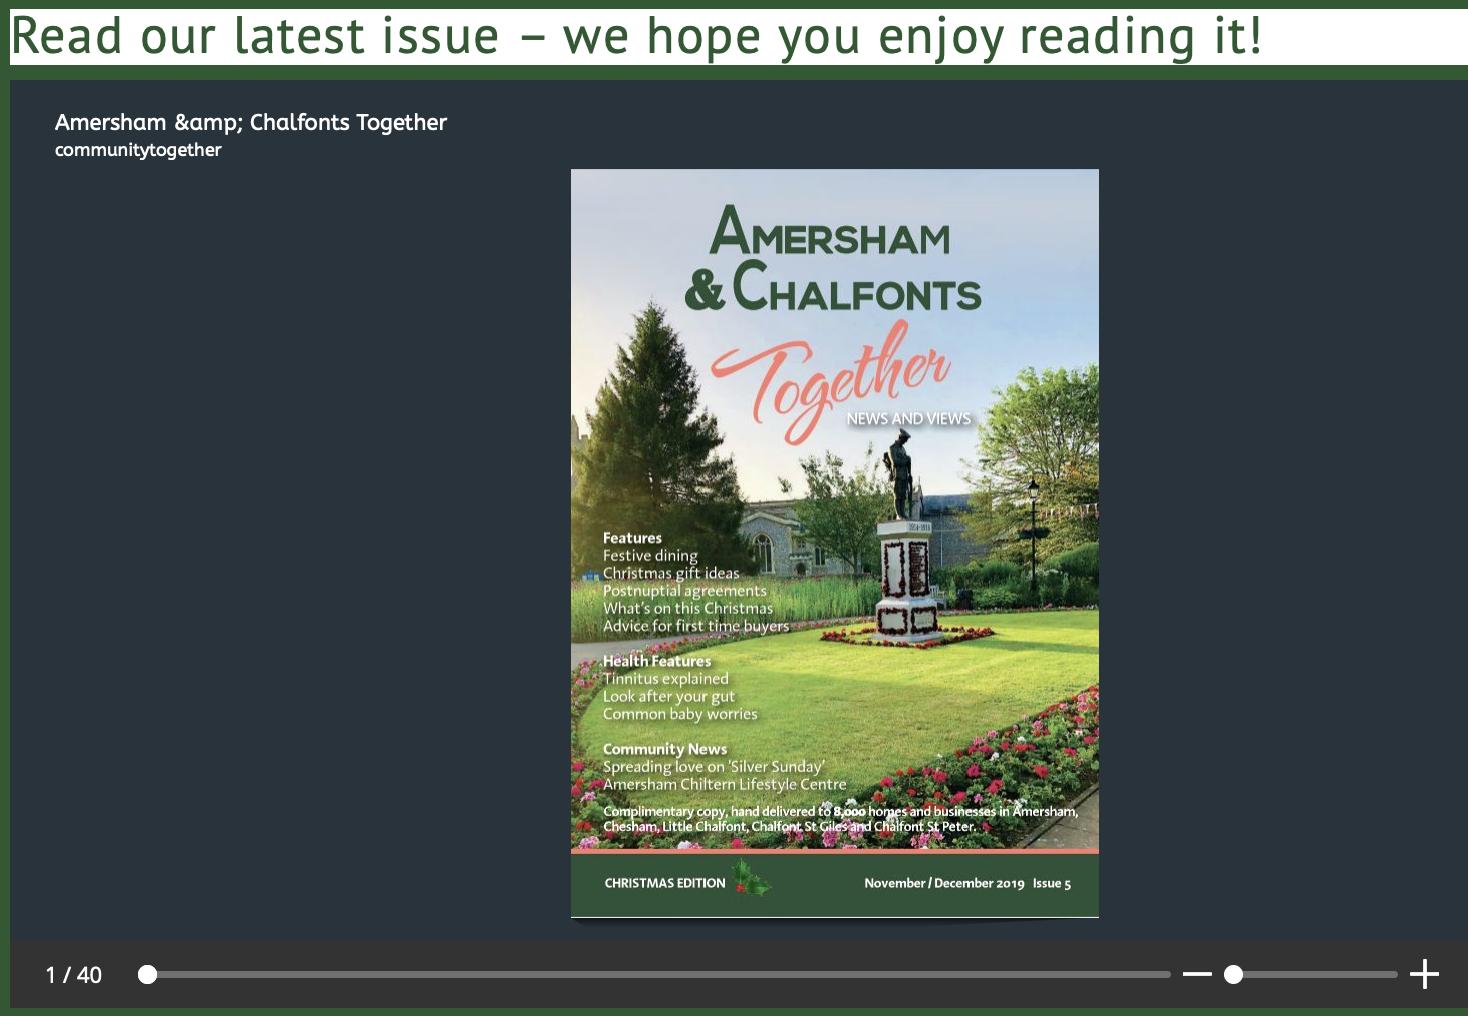 amersham-together-november-december-2019-community-magazine